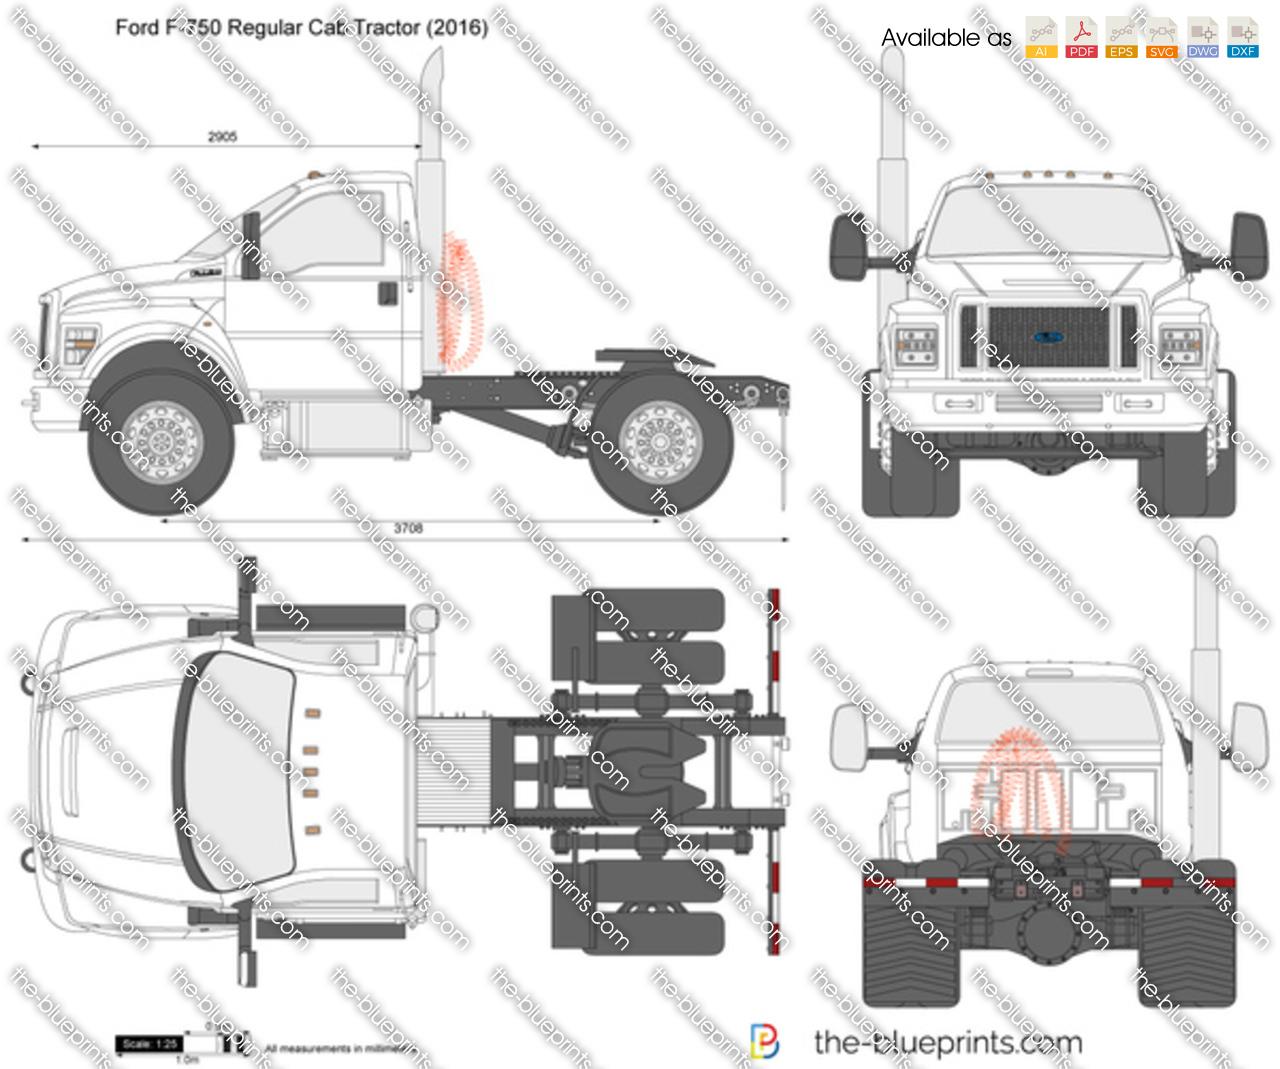 Ford F-750 Regular Cab Tractor